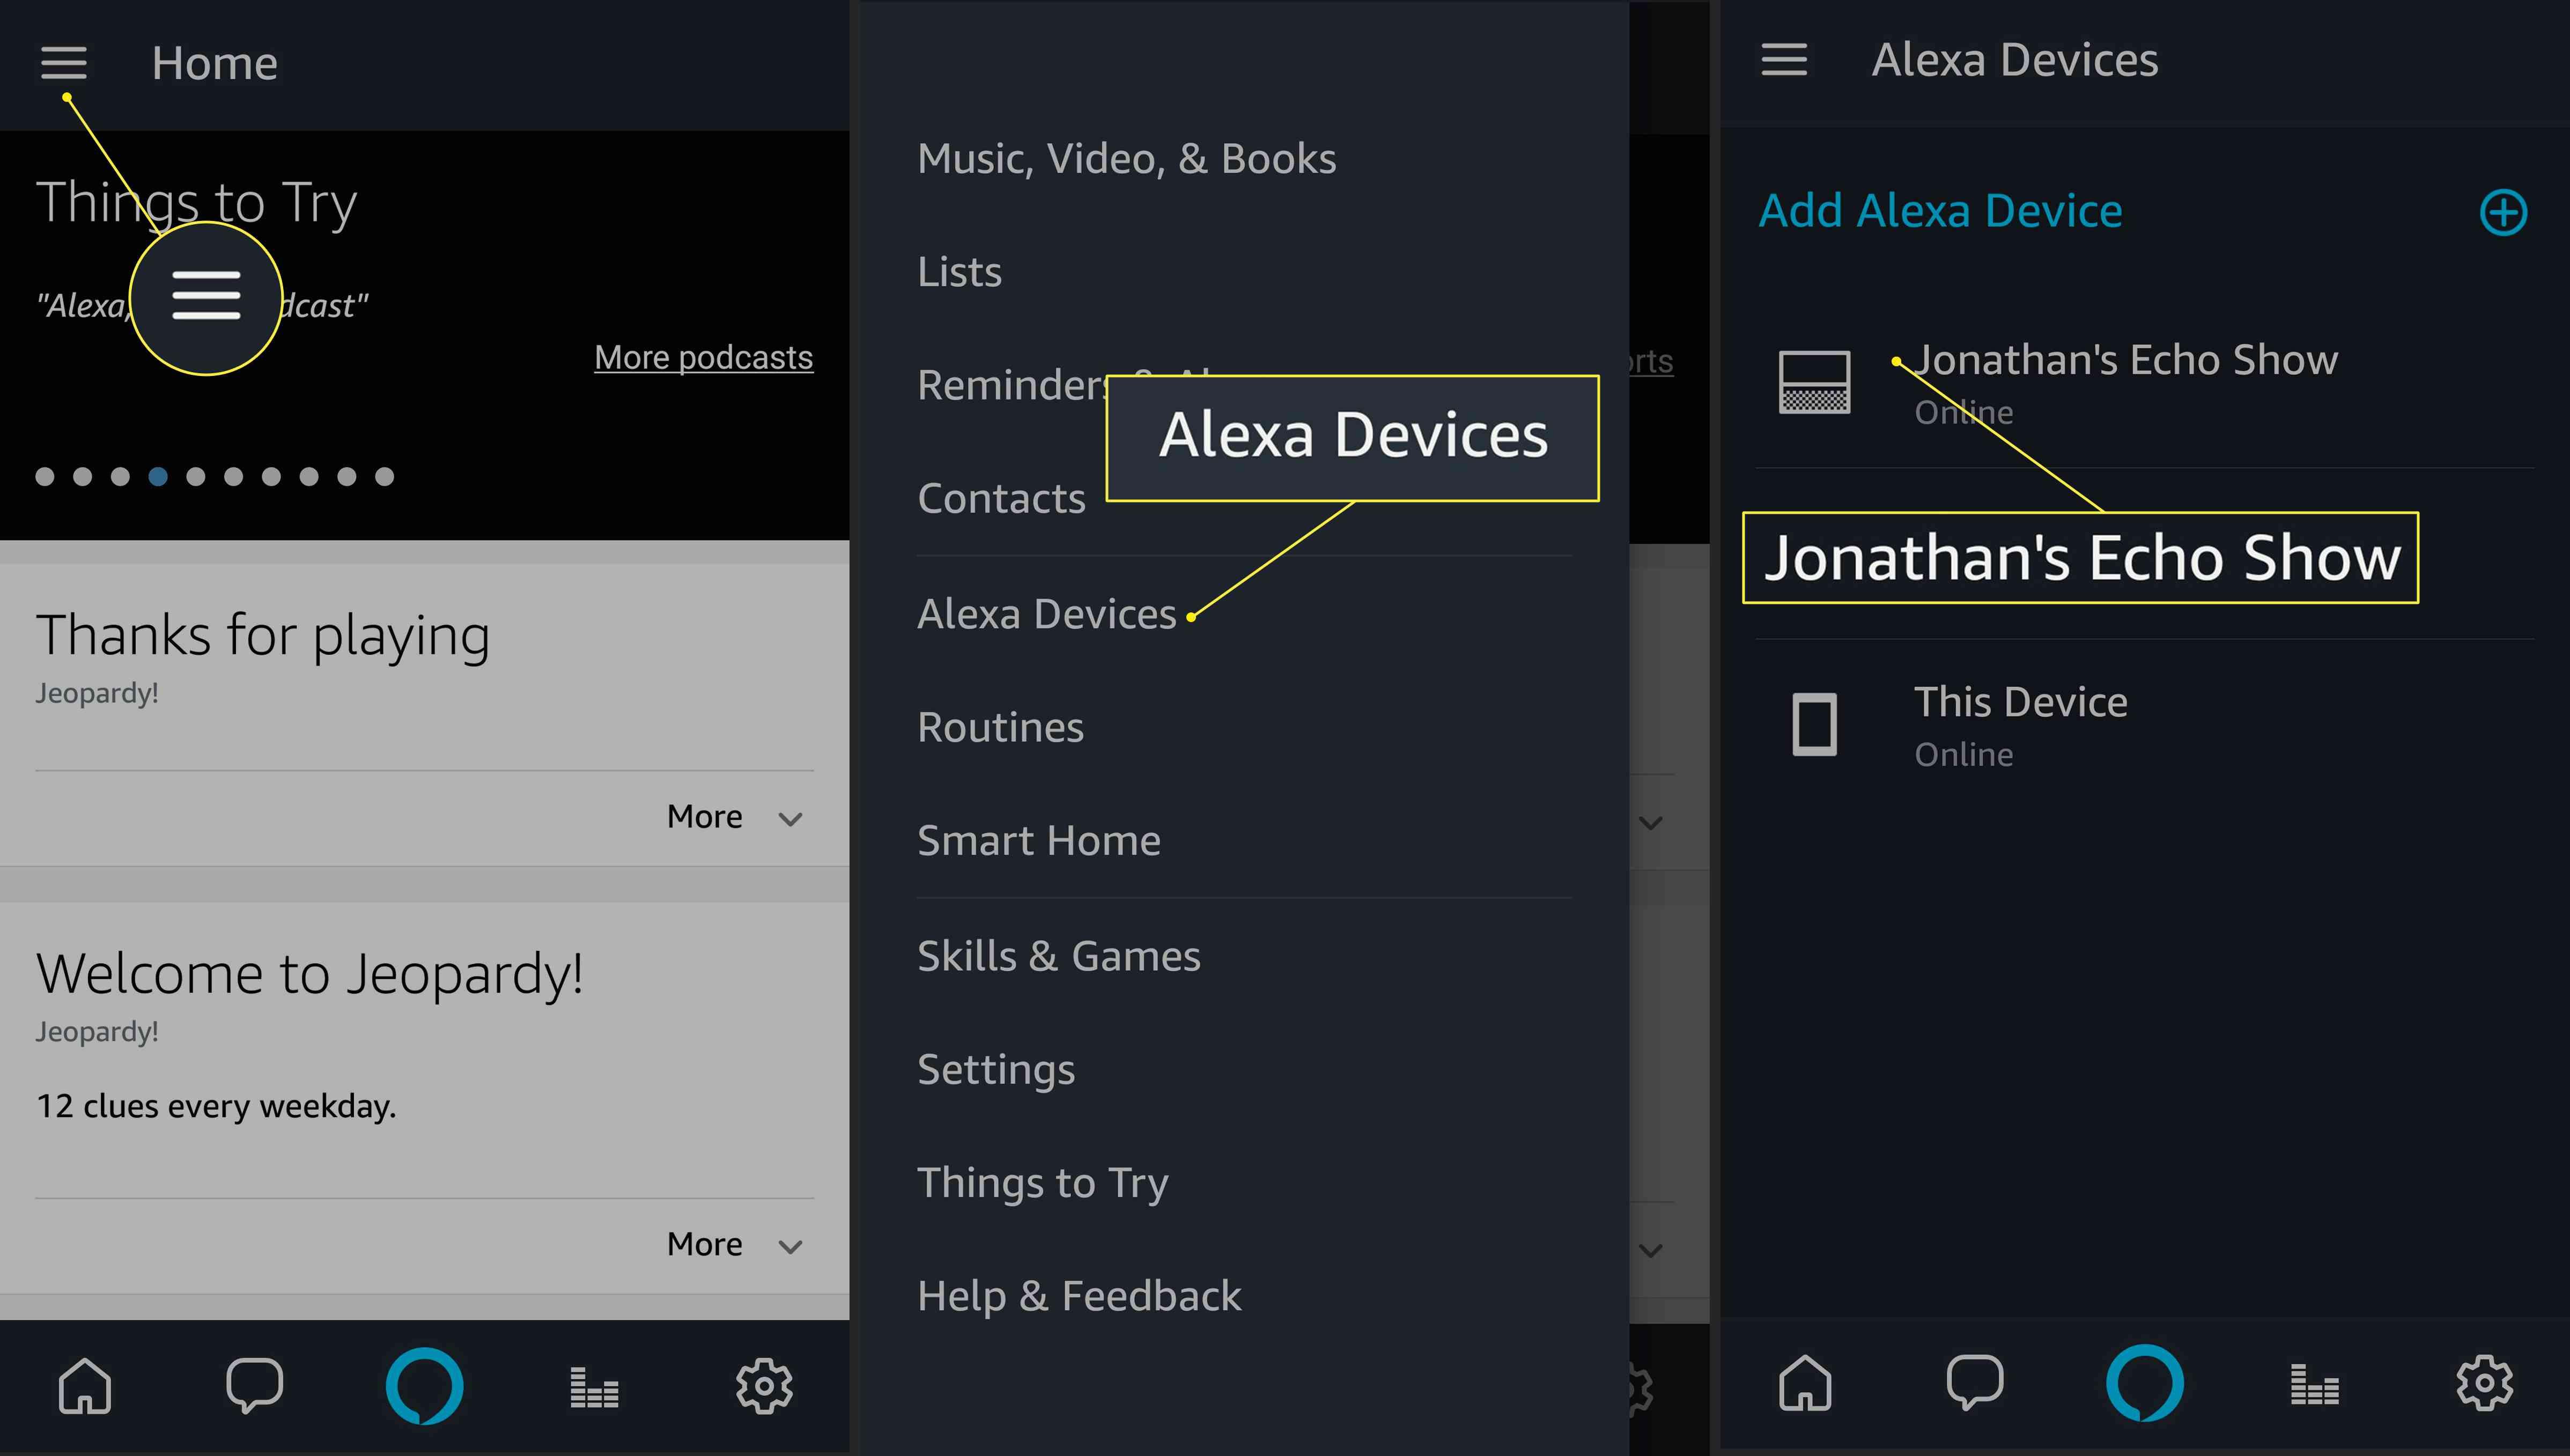 Selecting an Alexa Device in the Amazon Alexa app